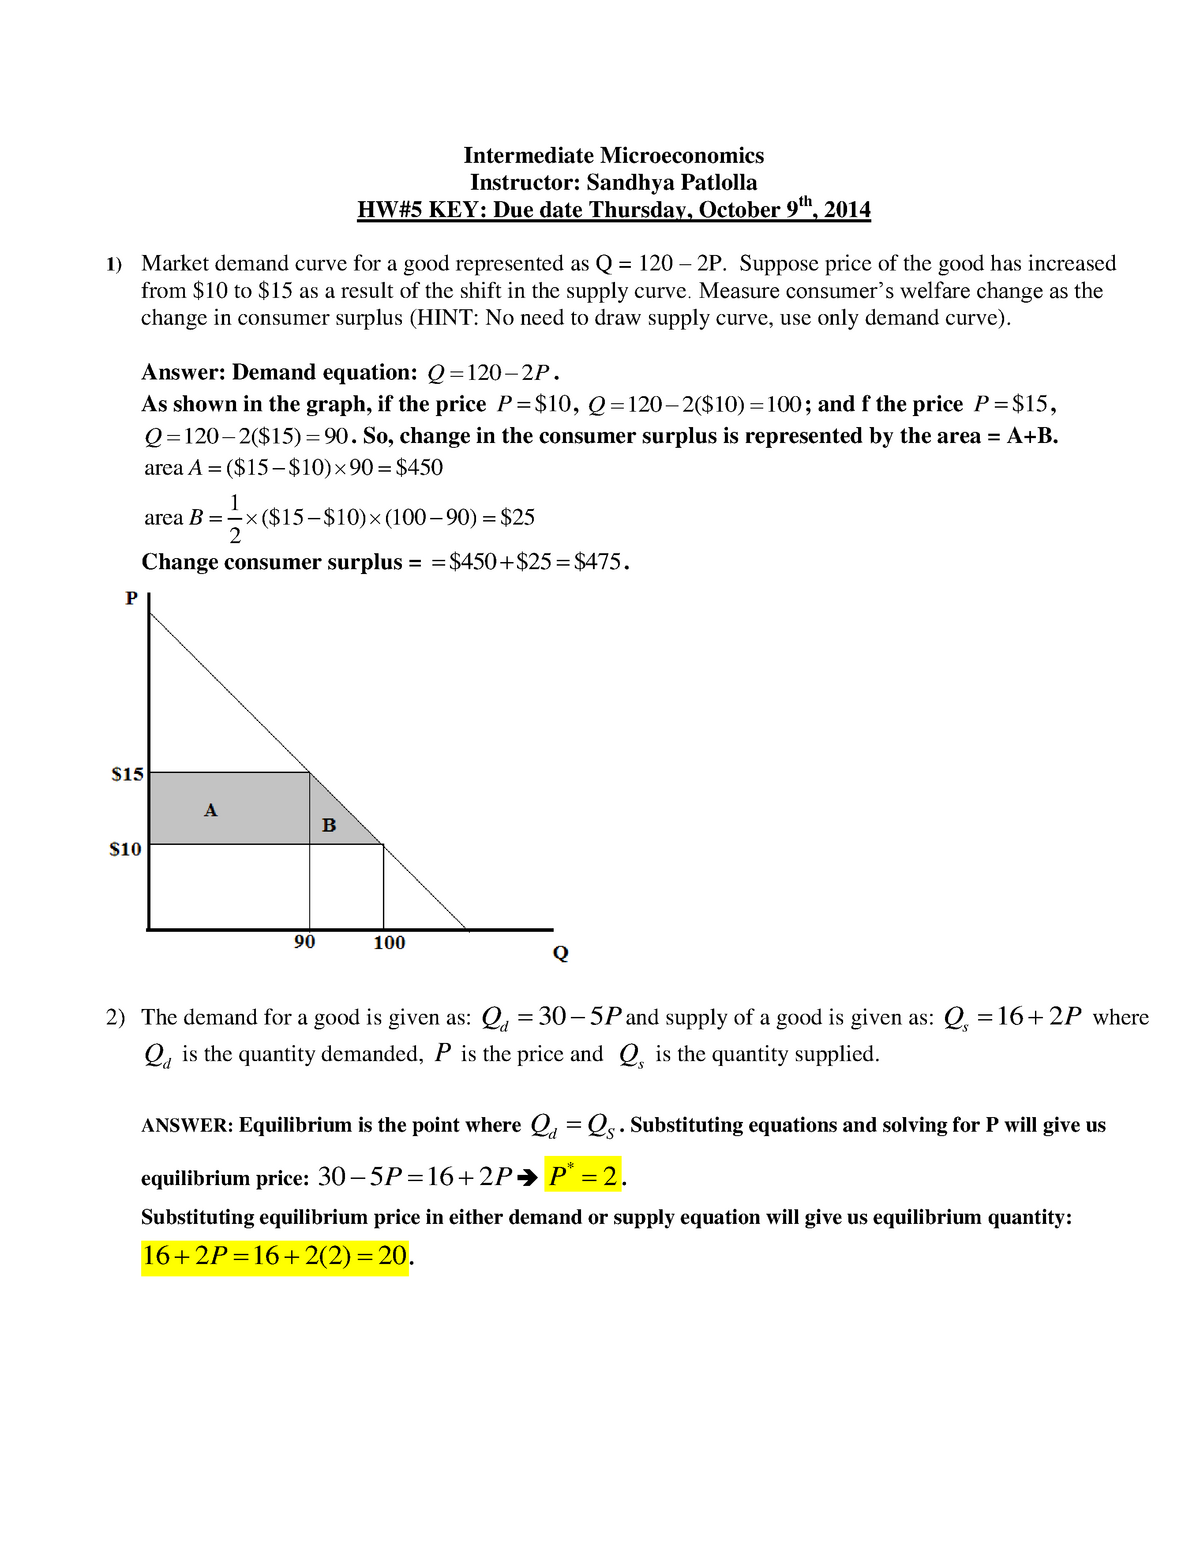 ECON 301 Fall 2014 HW5 KEY - ECON 301: Intermediate